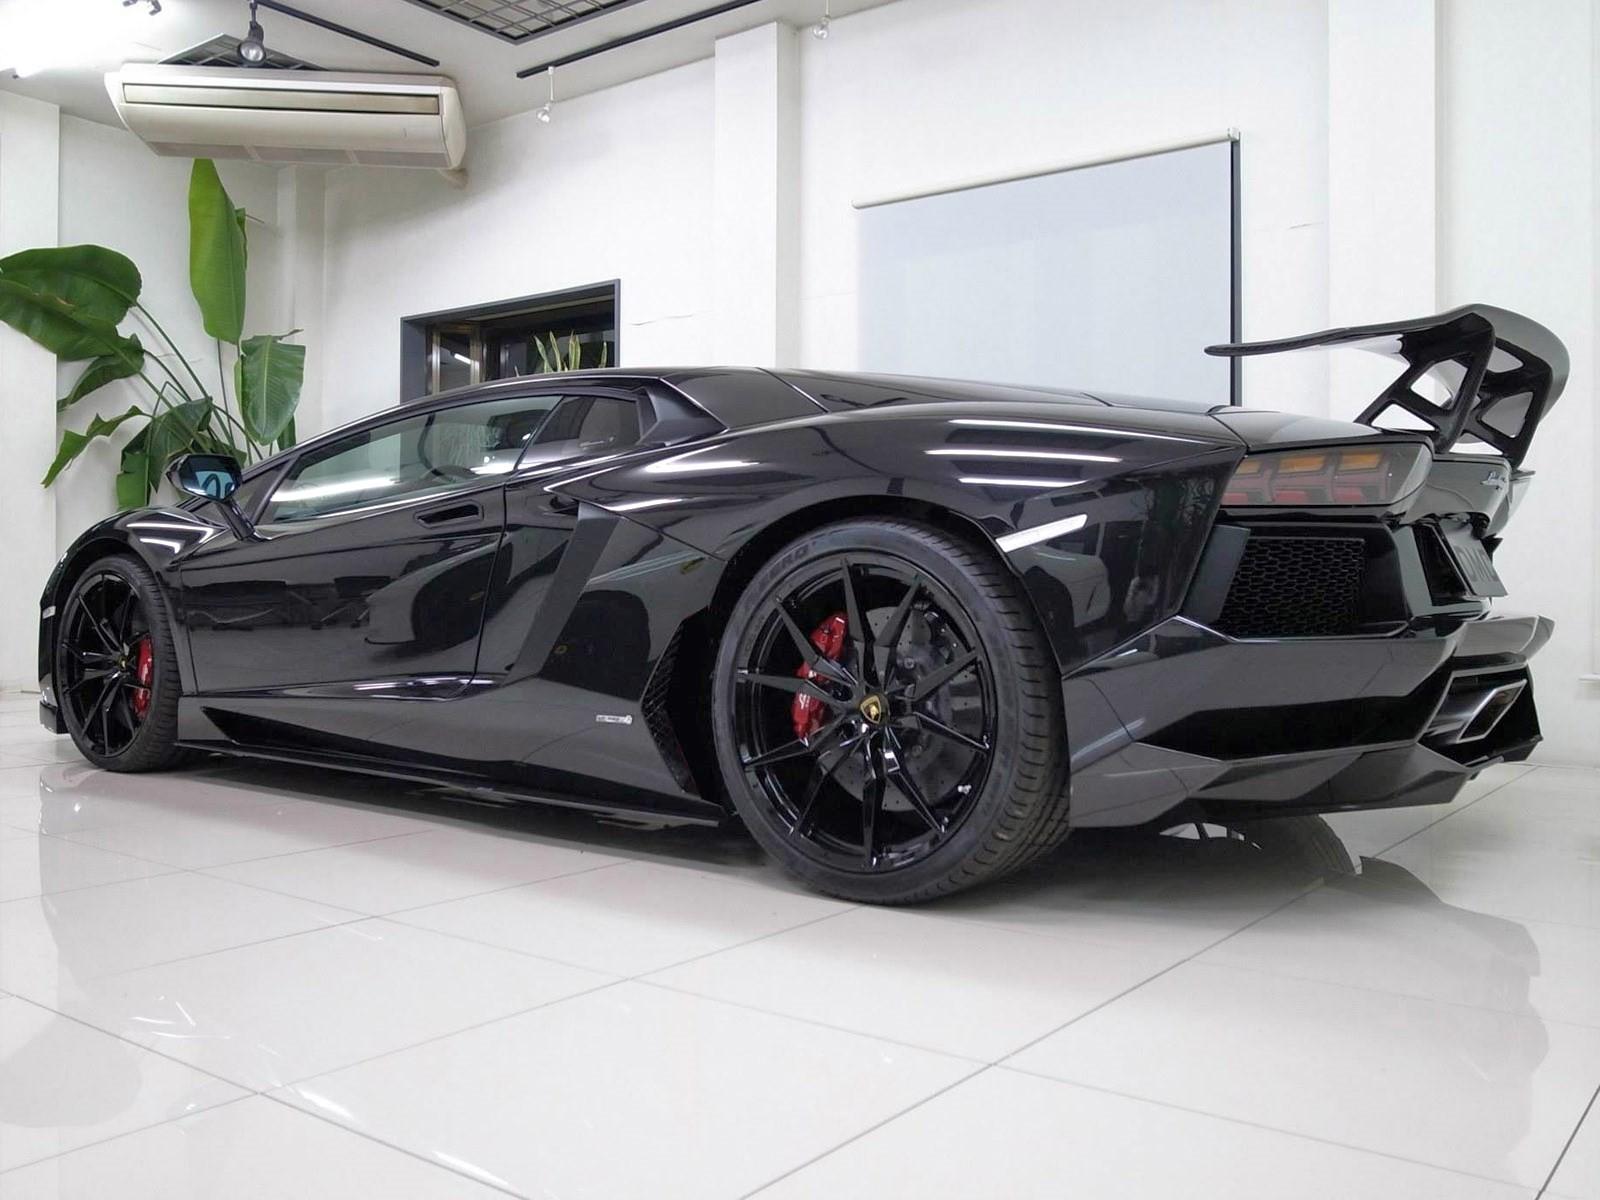 2013 Lamborghini Aventador lp700 Autoproject by DMC Design